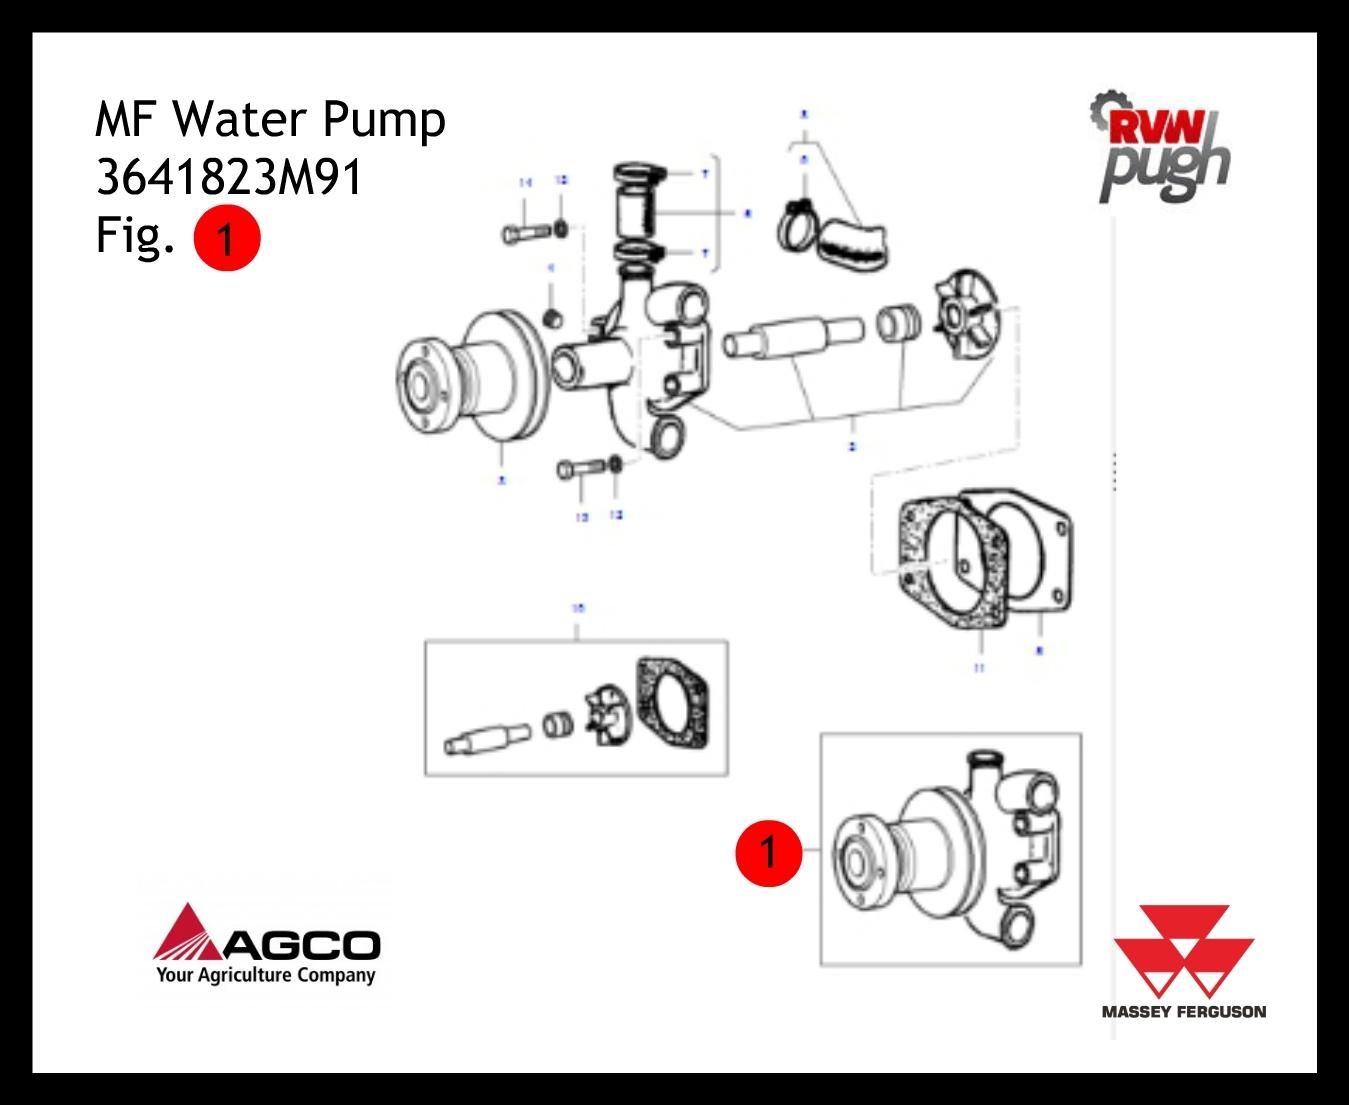 Massey Ferguson Water Pump